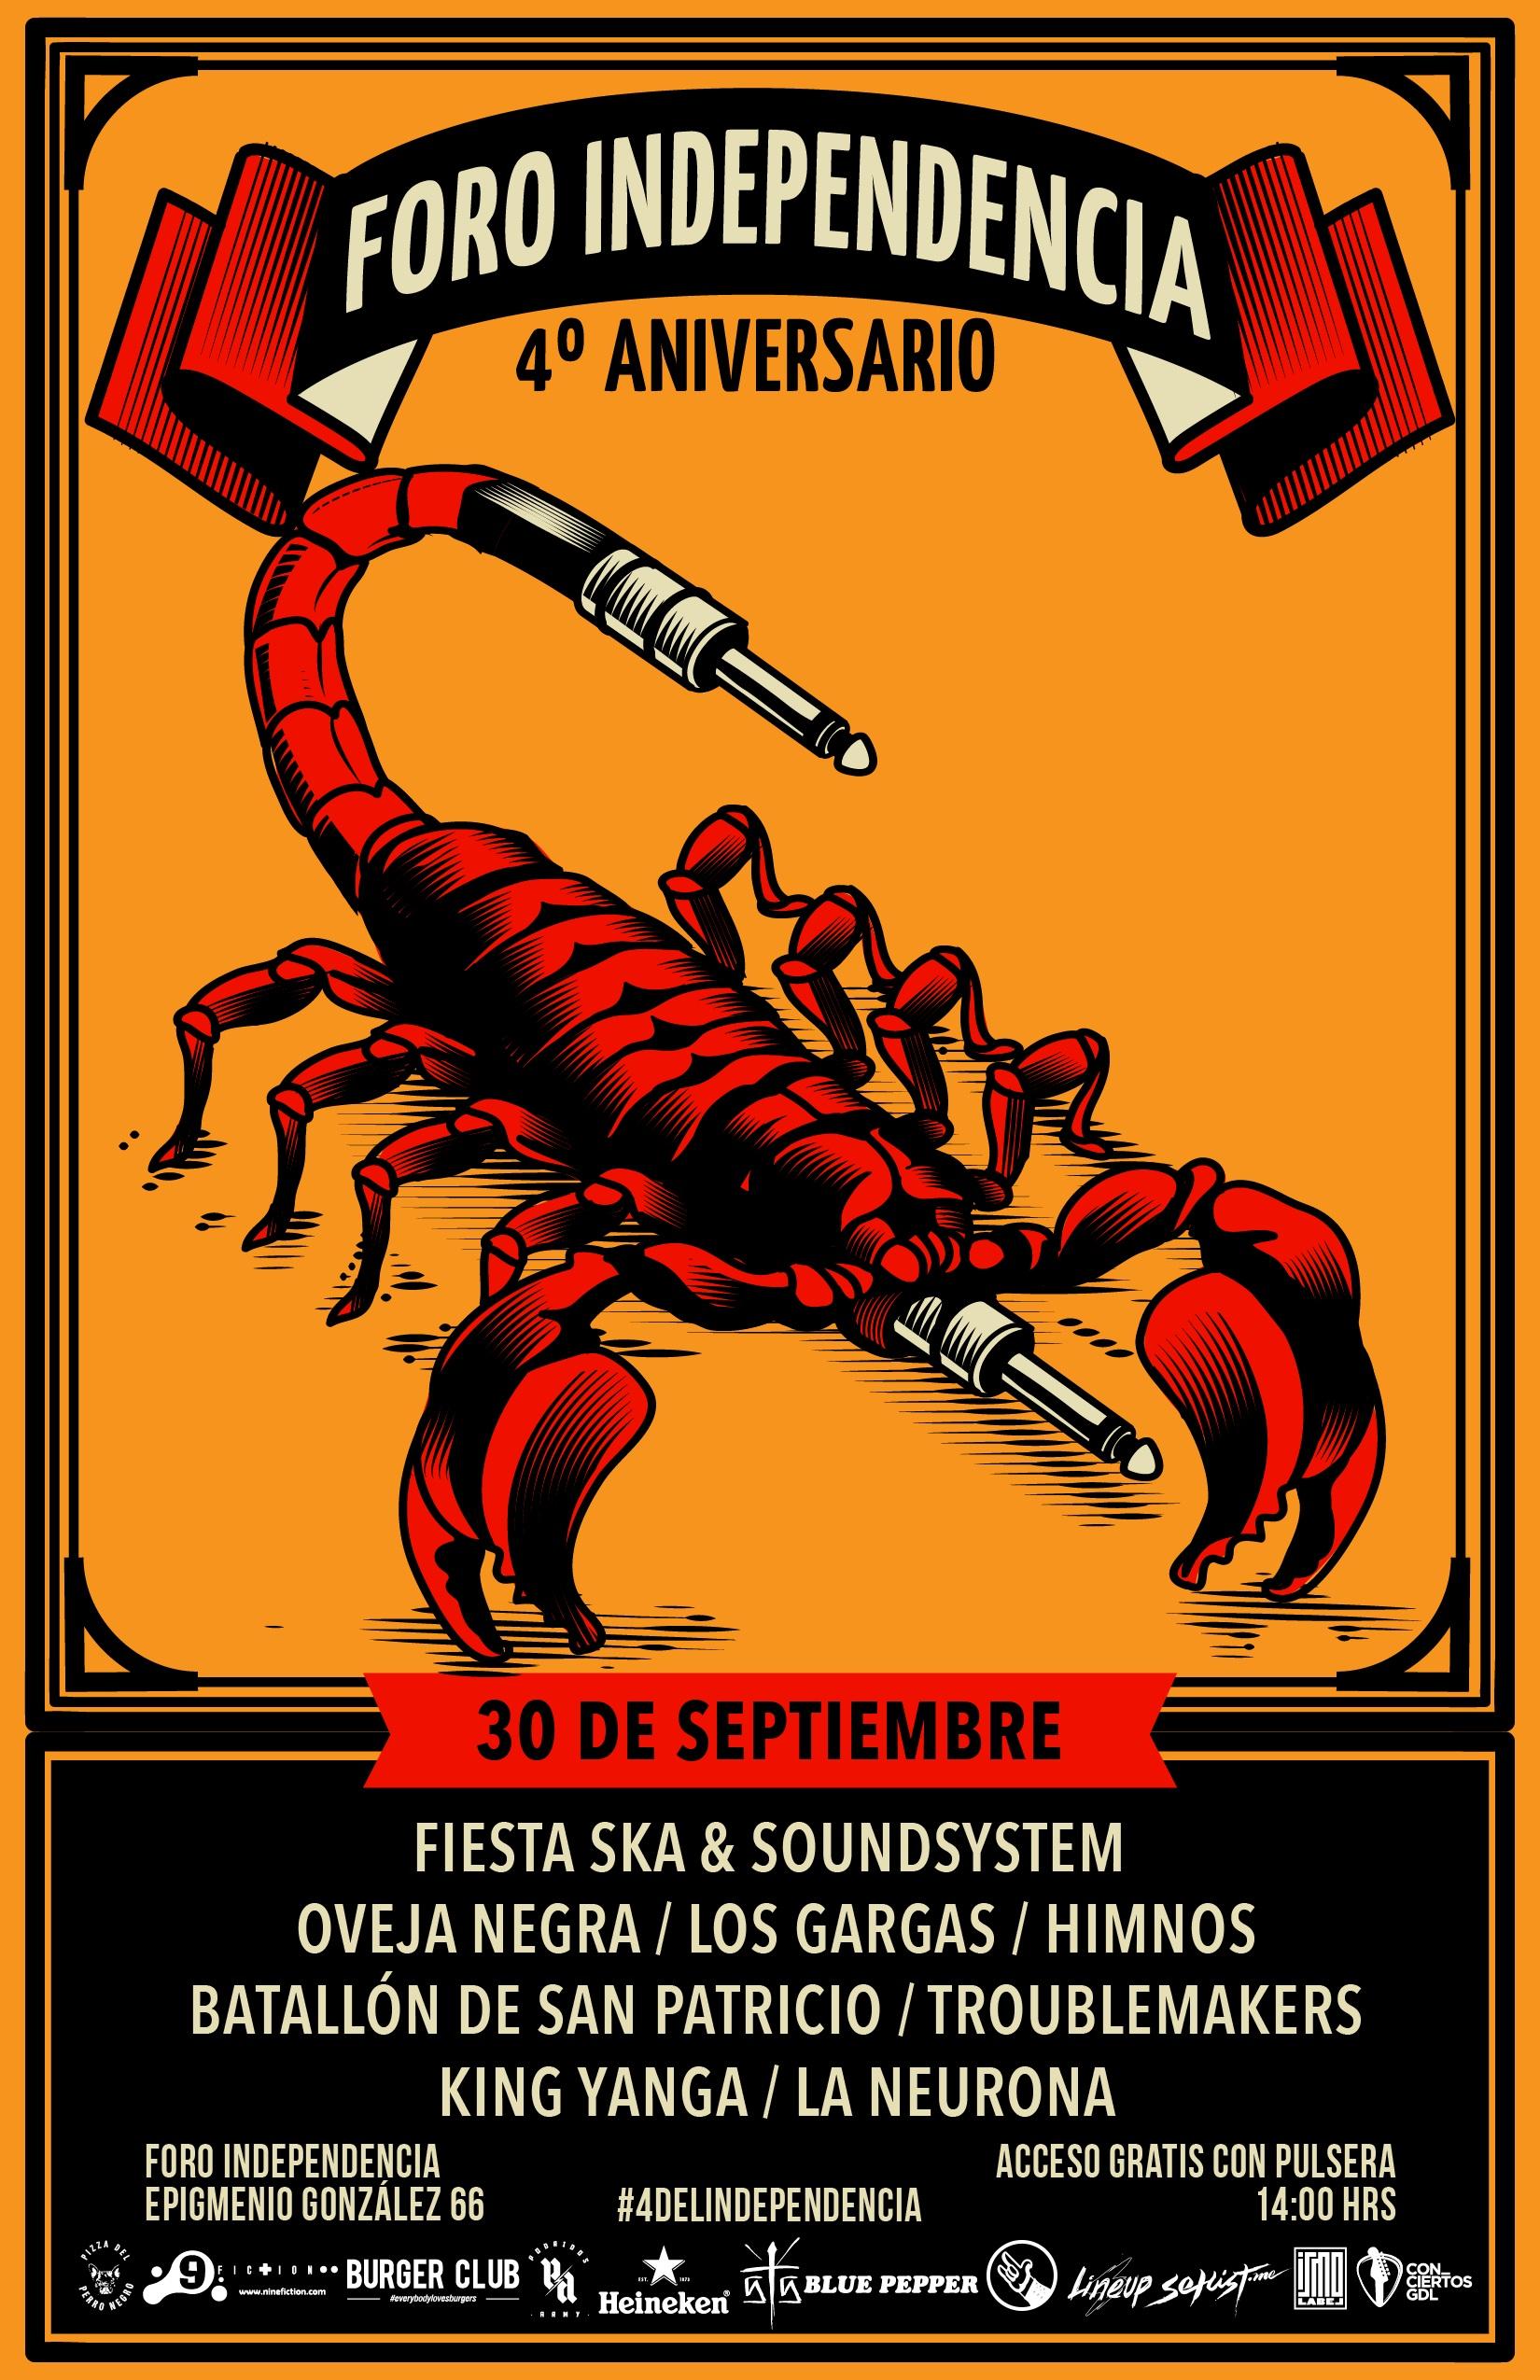 Fiesta Ska & Soundsystem / Foro Independencia